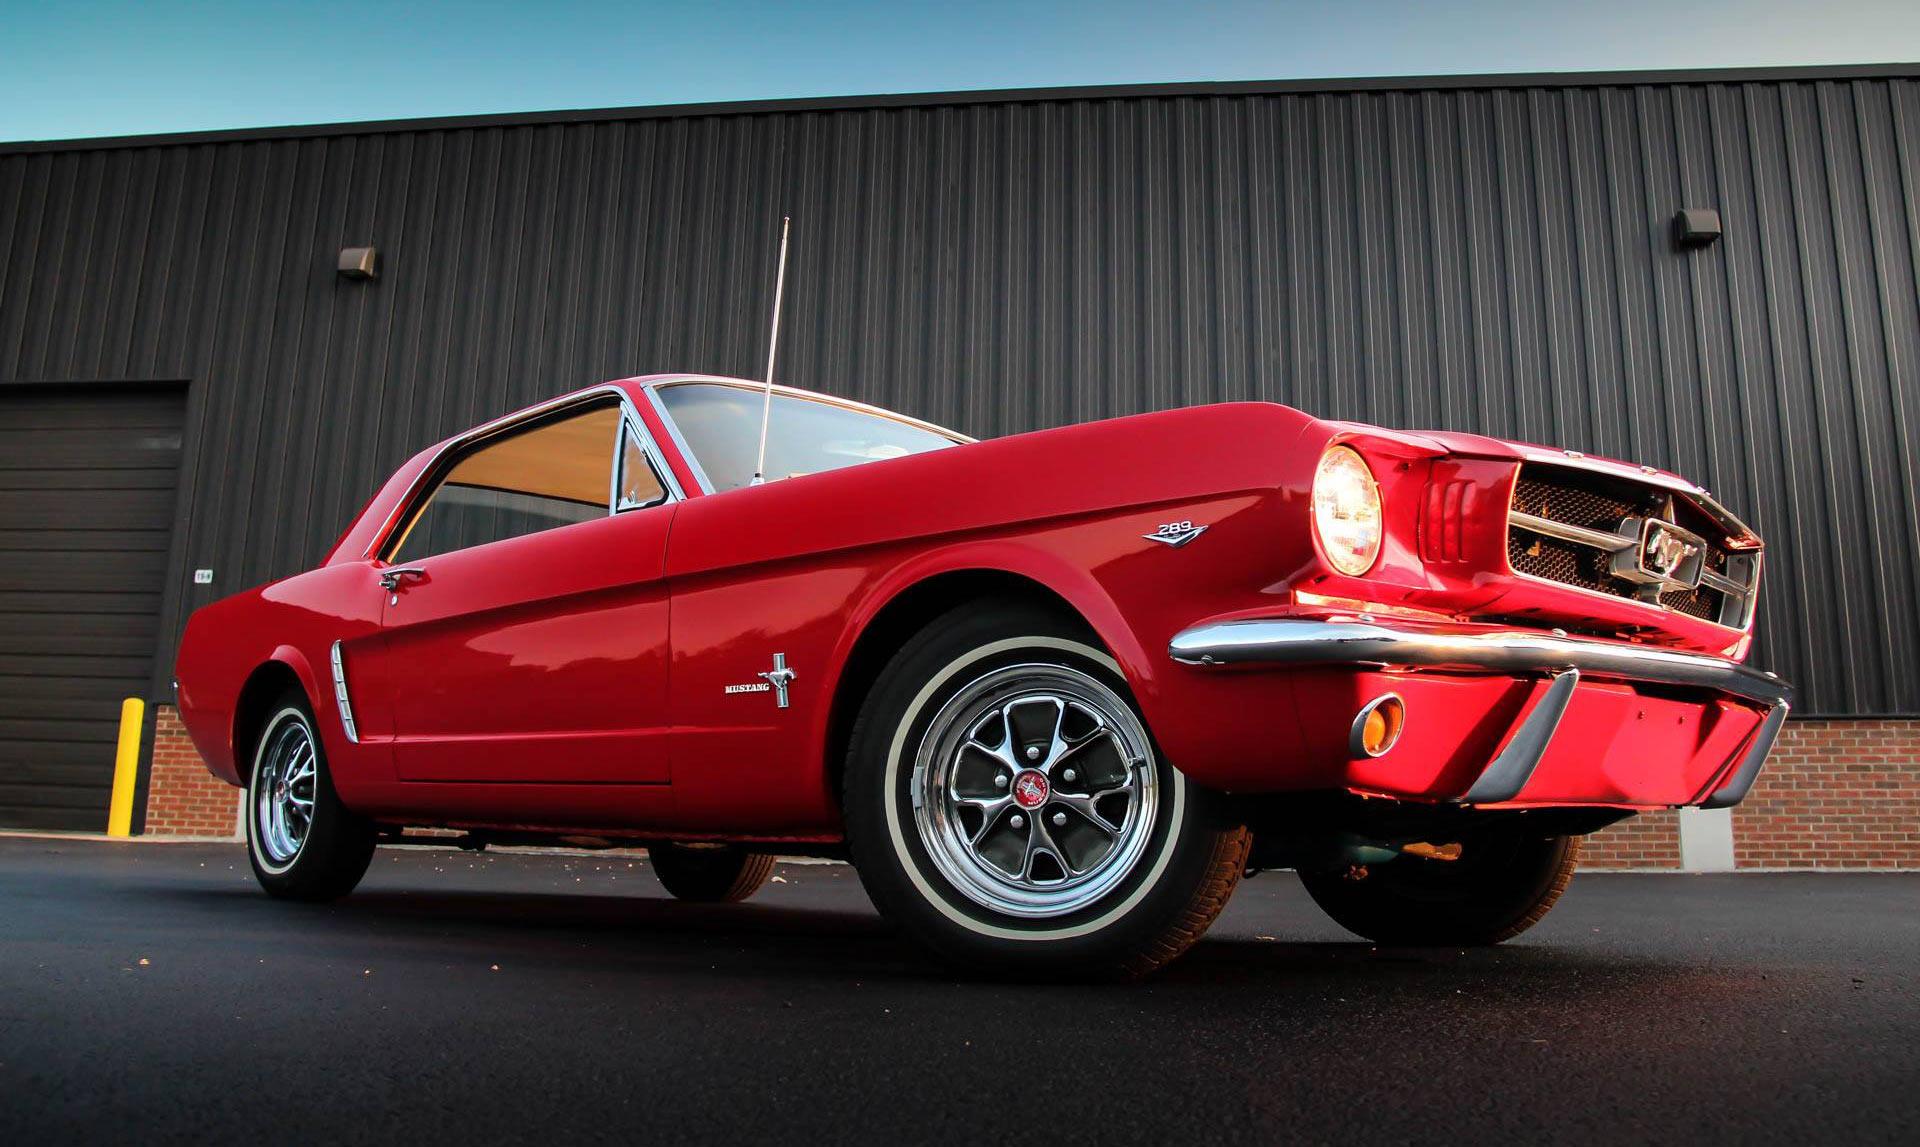 Ace Custom Classics - Classic Car Restoration